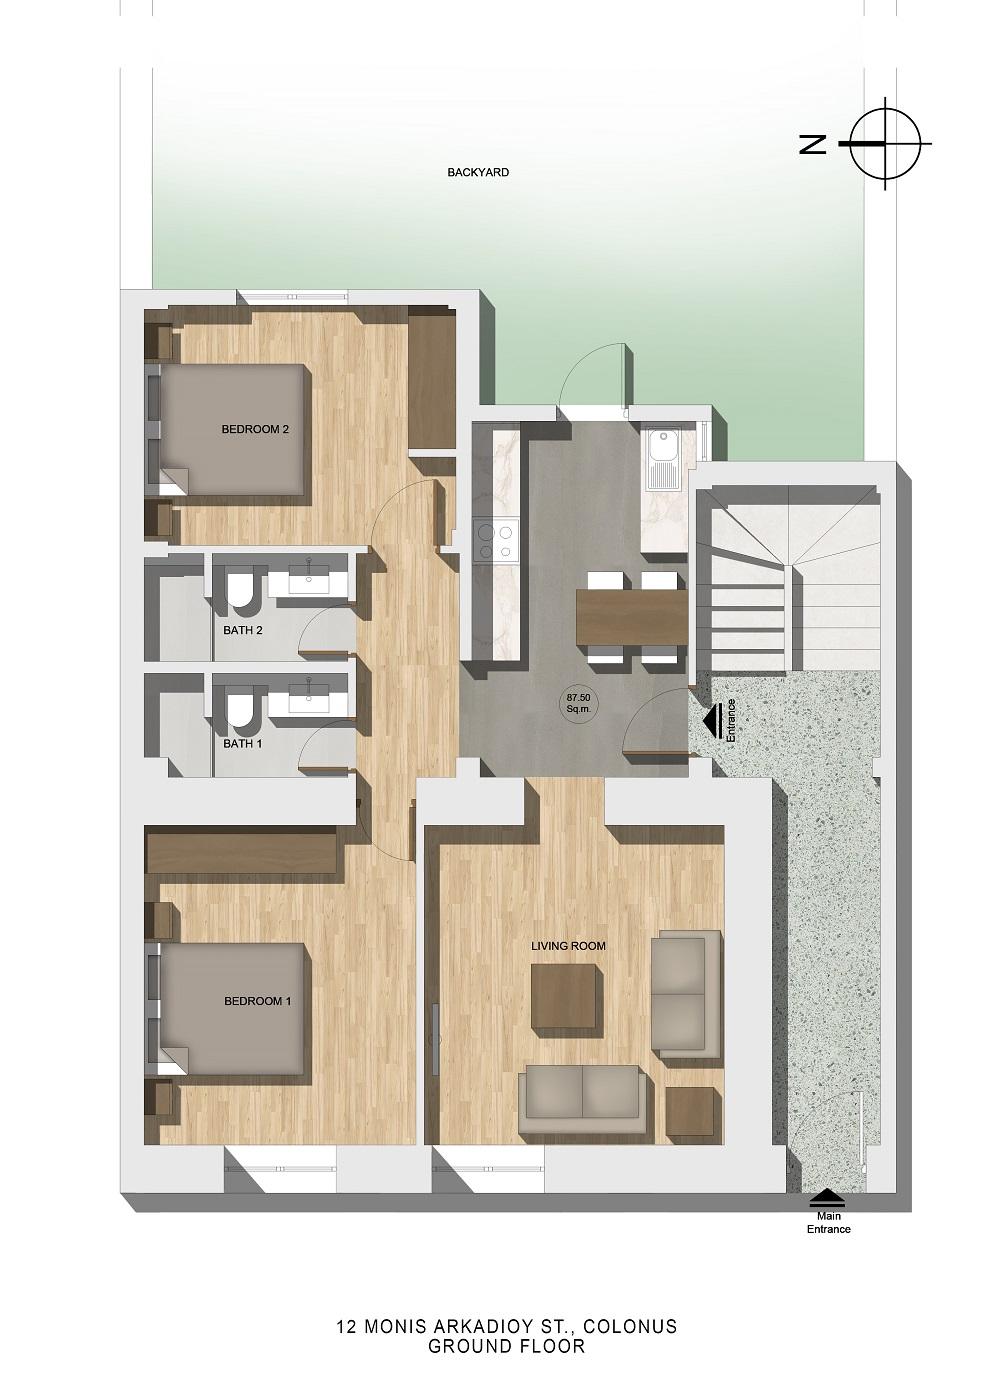 Monis Αrkadiou 12 ground floor plan